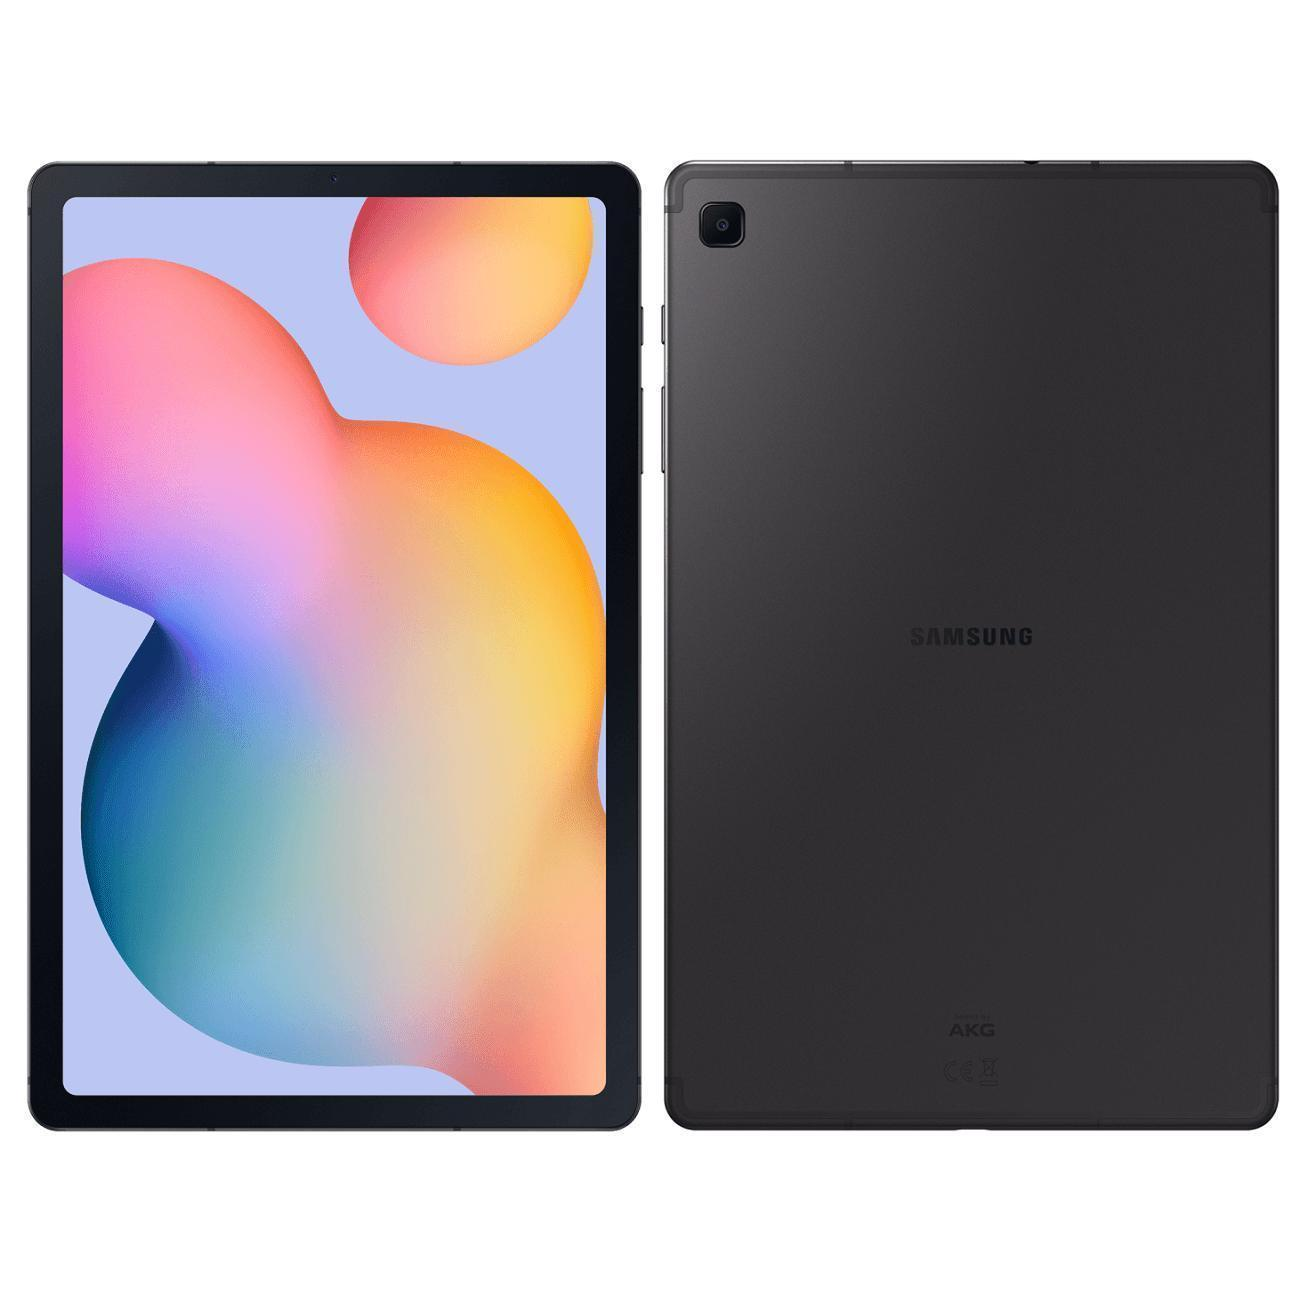 Galaxy Tab S6 Lite (2020) - WiFi